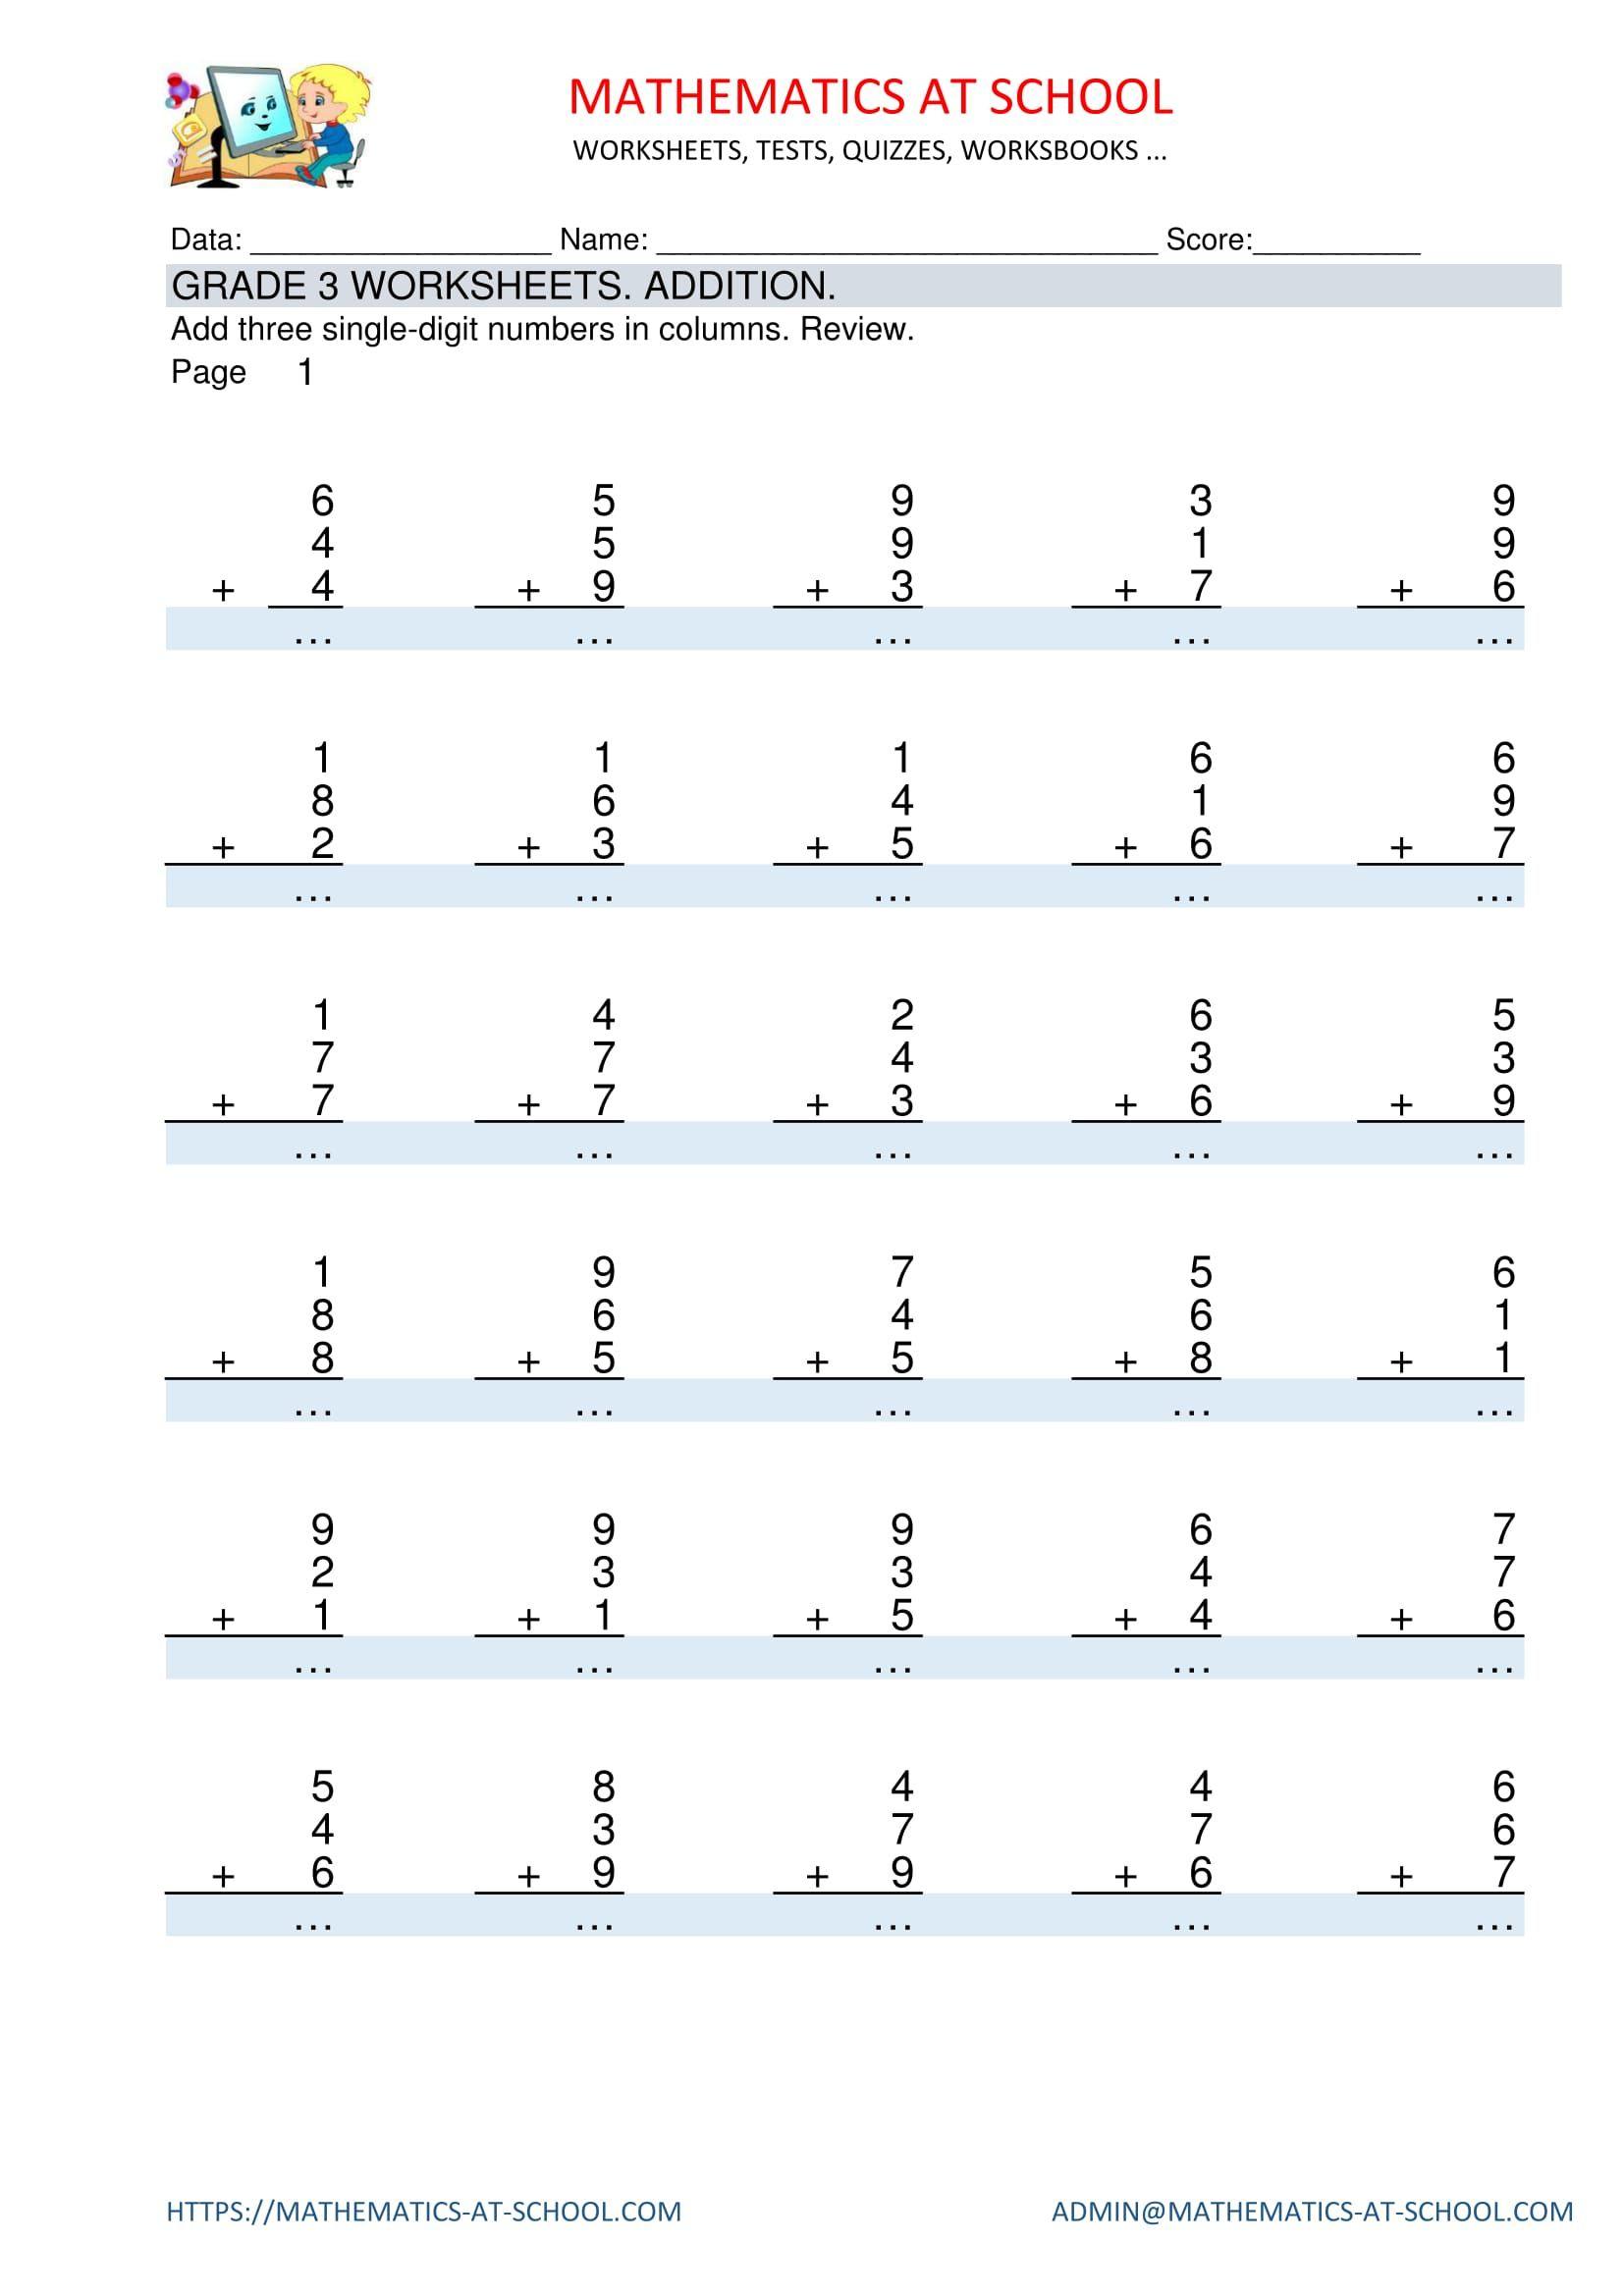 Grade 3 Maths Worksheets: Addition Adding Three 1-Digit for Printable Multiplication Worksheets Grade 3